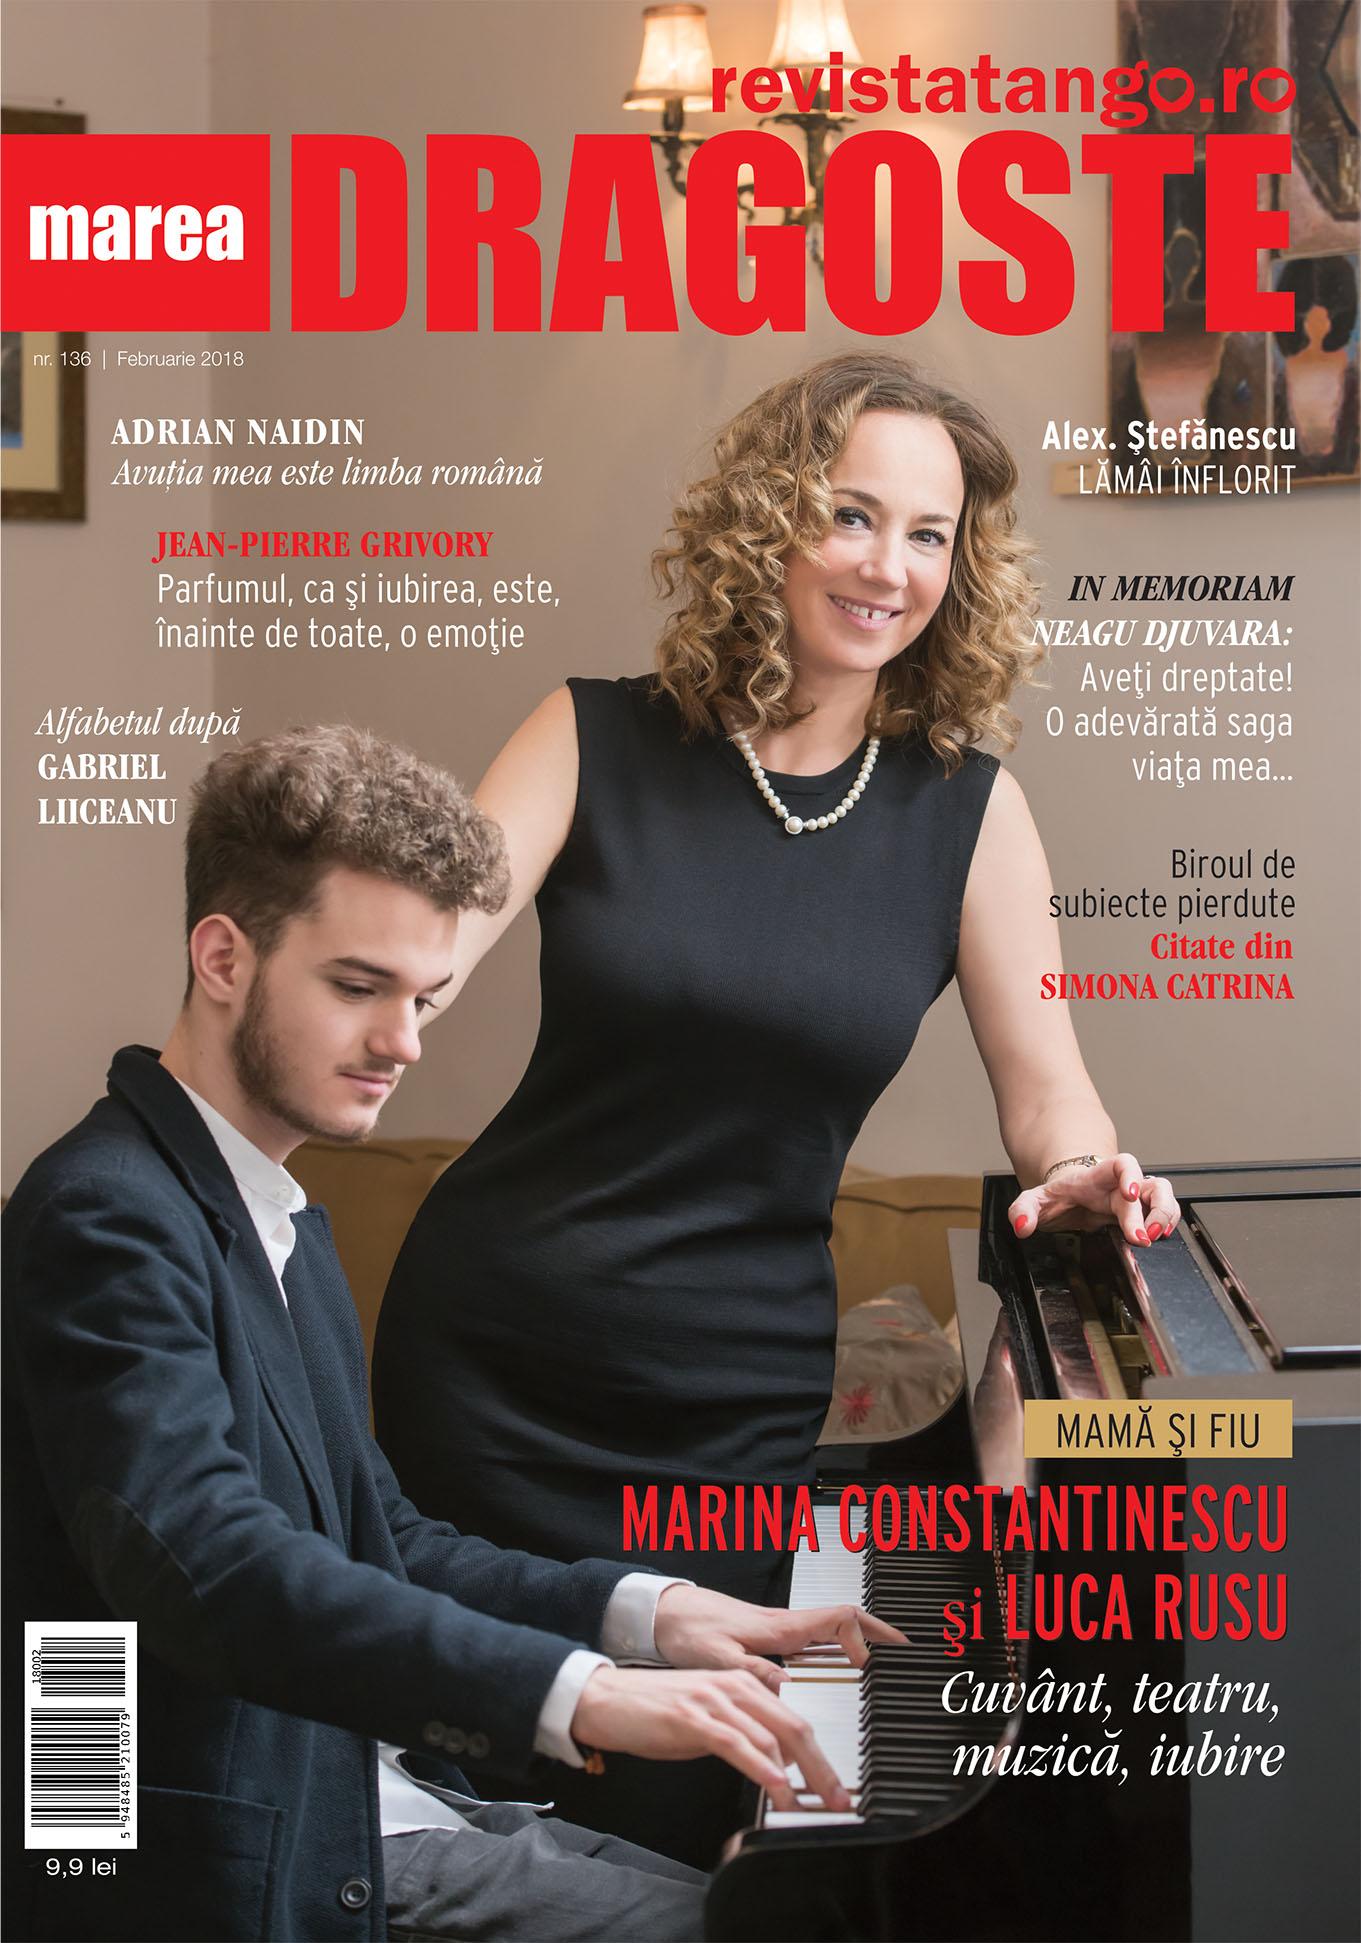 Marina Constantinescu si Luca Rusu pe coperta Marea Dragoste-revistatango.ro, nr. 136, februarie 2018